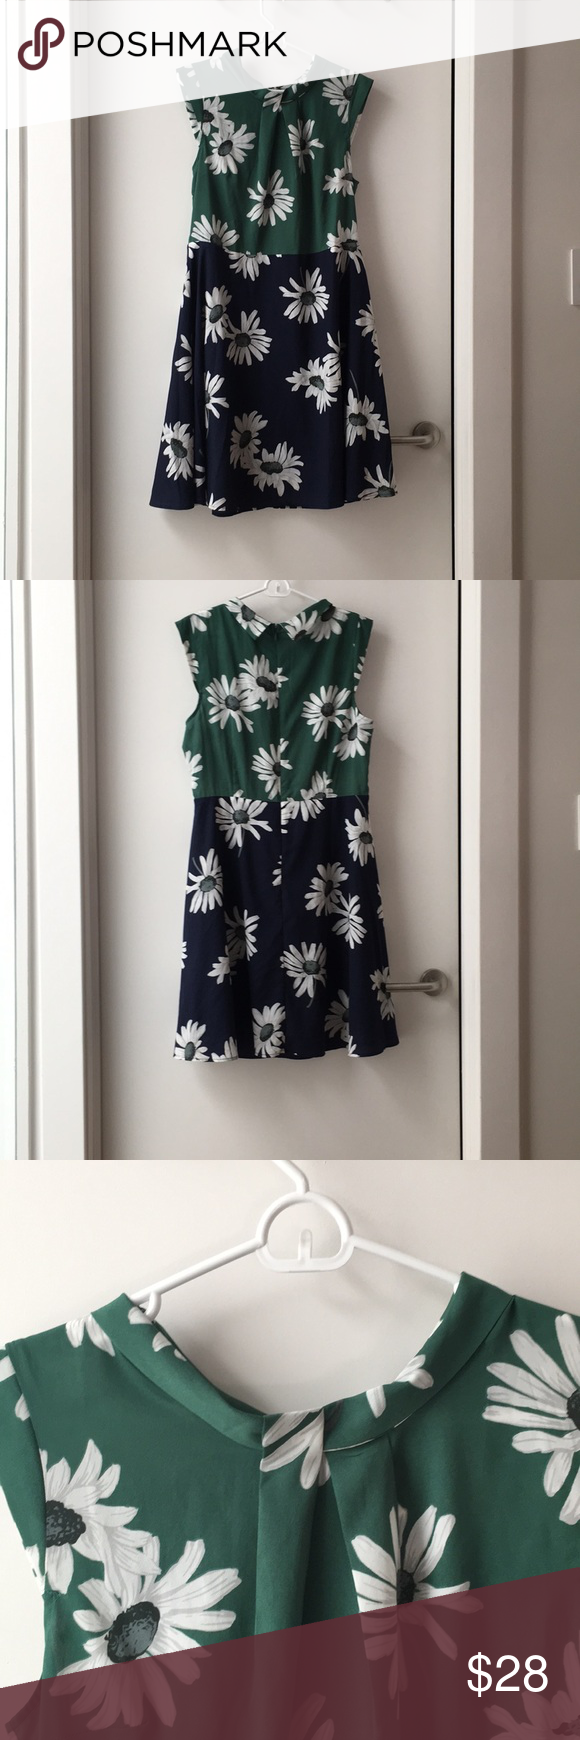 Size Xl Isani For Target Two Tone Floral Dress Floral Dress Clothes Design Dresses [ 1740 x 580 Pixel ]